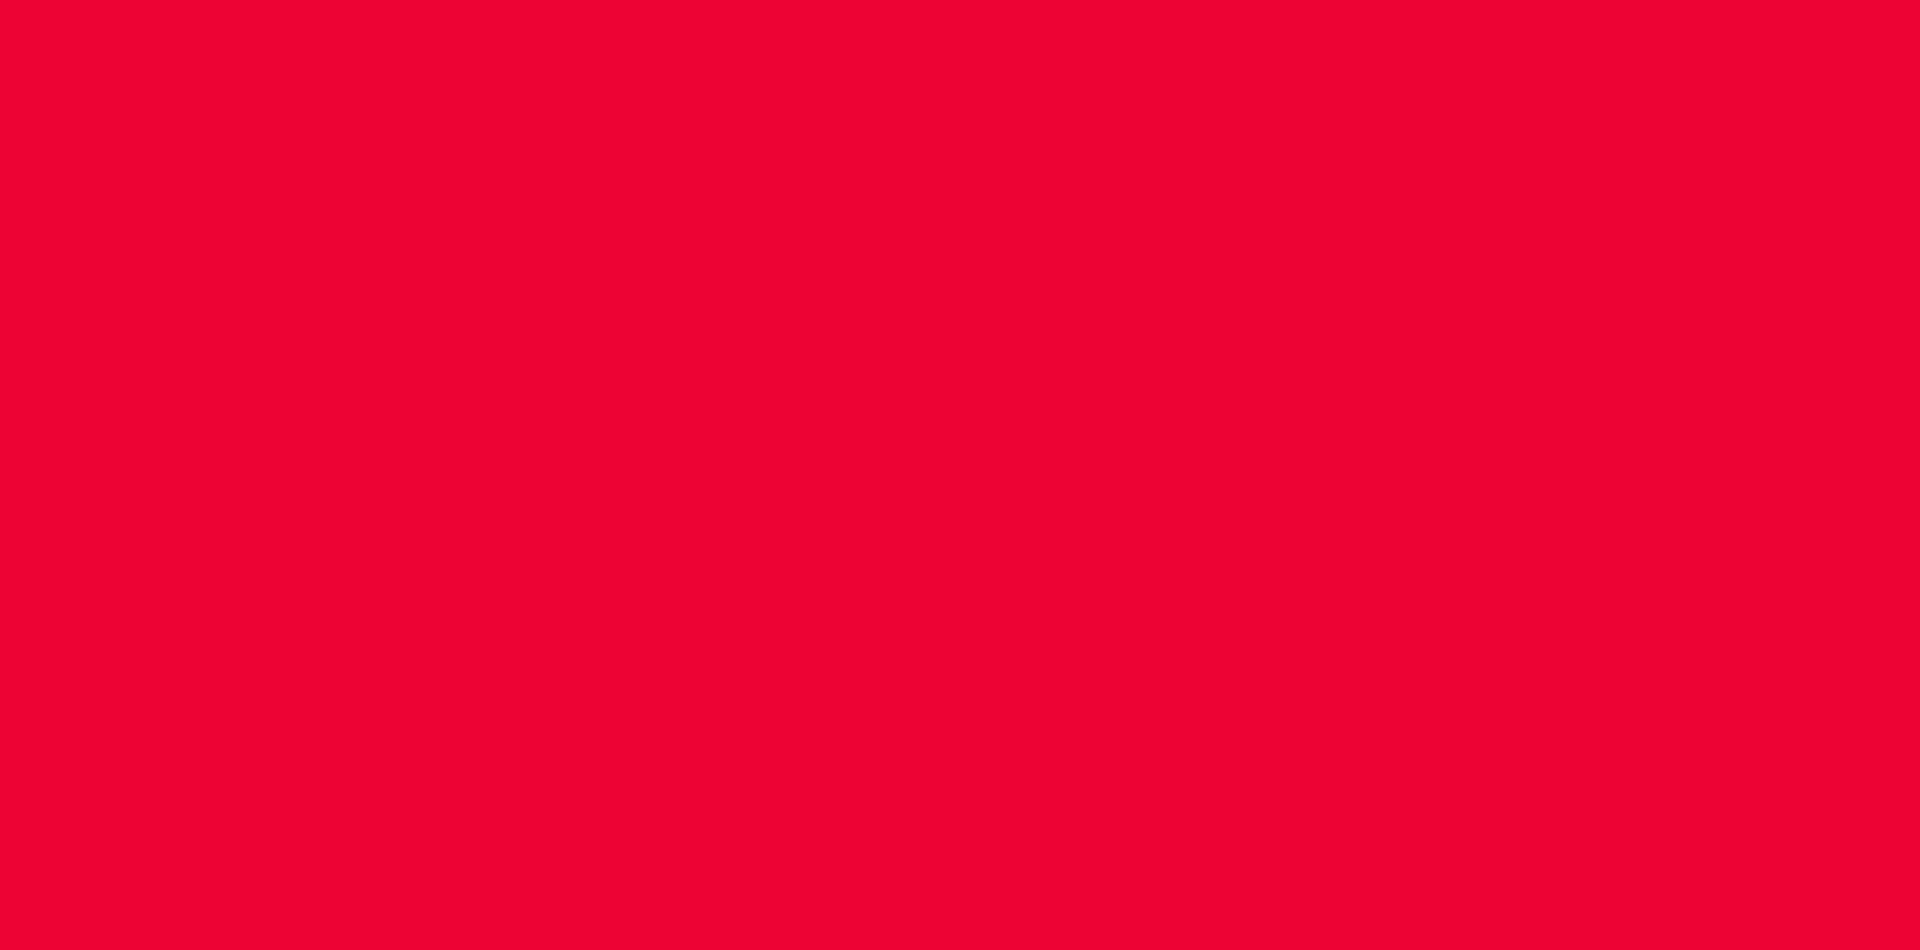 sagano-banner-052021